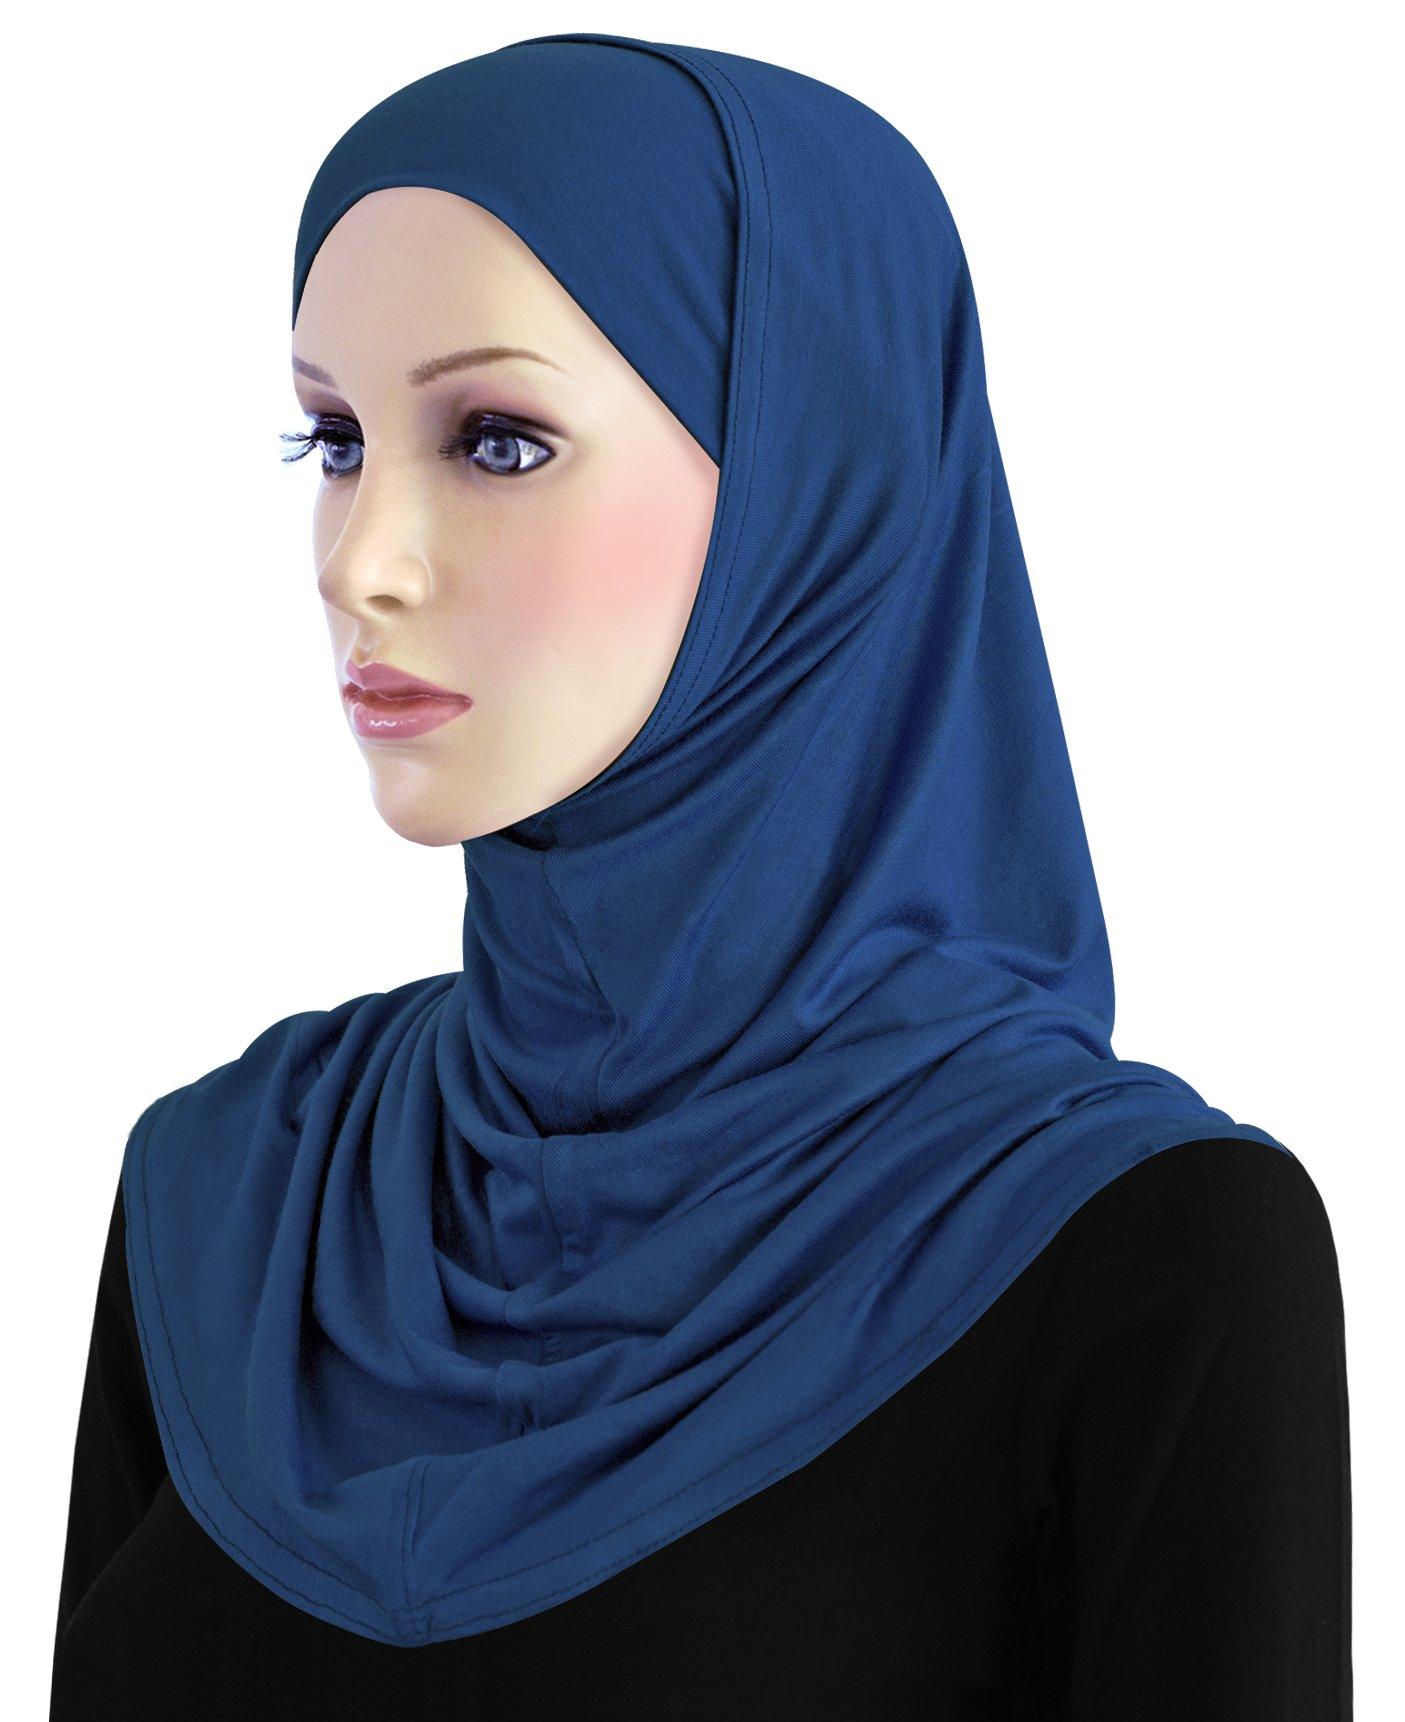 Cotton Hijab 2 piece Amira Set Easy Instant Pull-On Hood & Tube Cap (Royal Blue) by Khatib Fashions (Image #1)